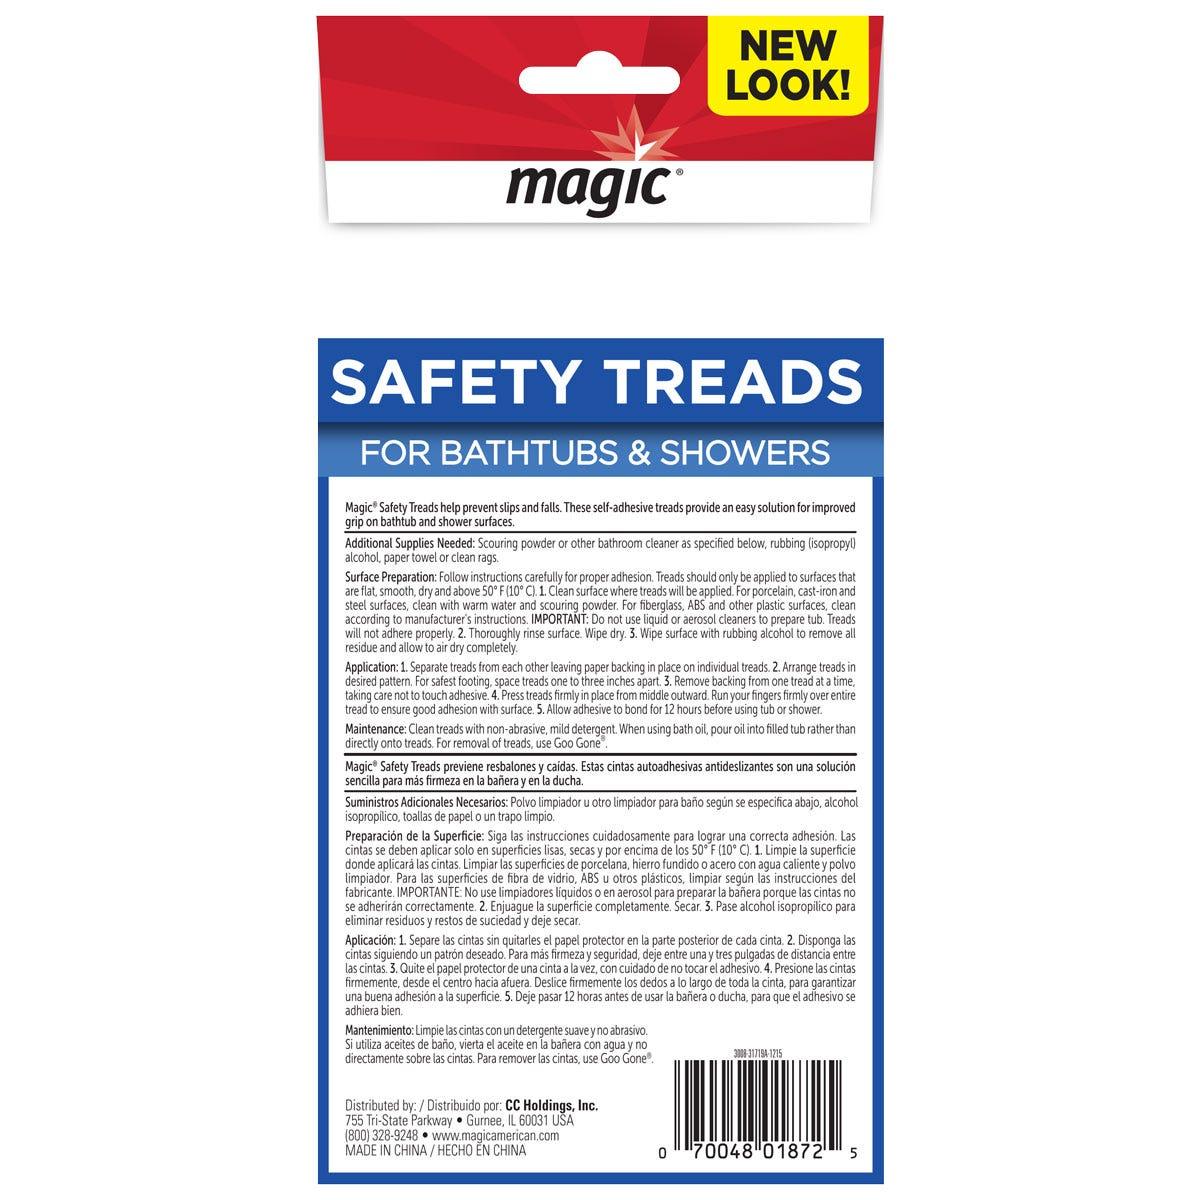 https://googone.com/media/catalog/product/m/a/magic-shower-safety-treads_back.jpg